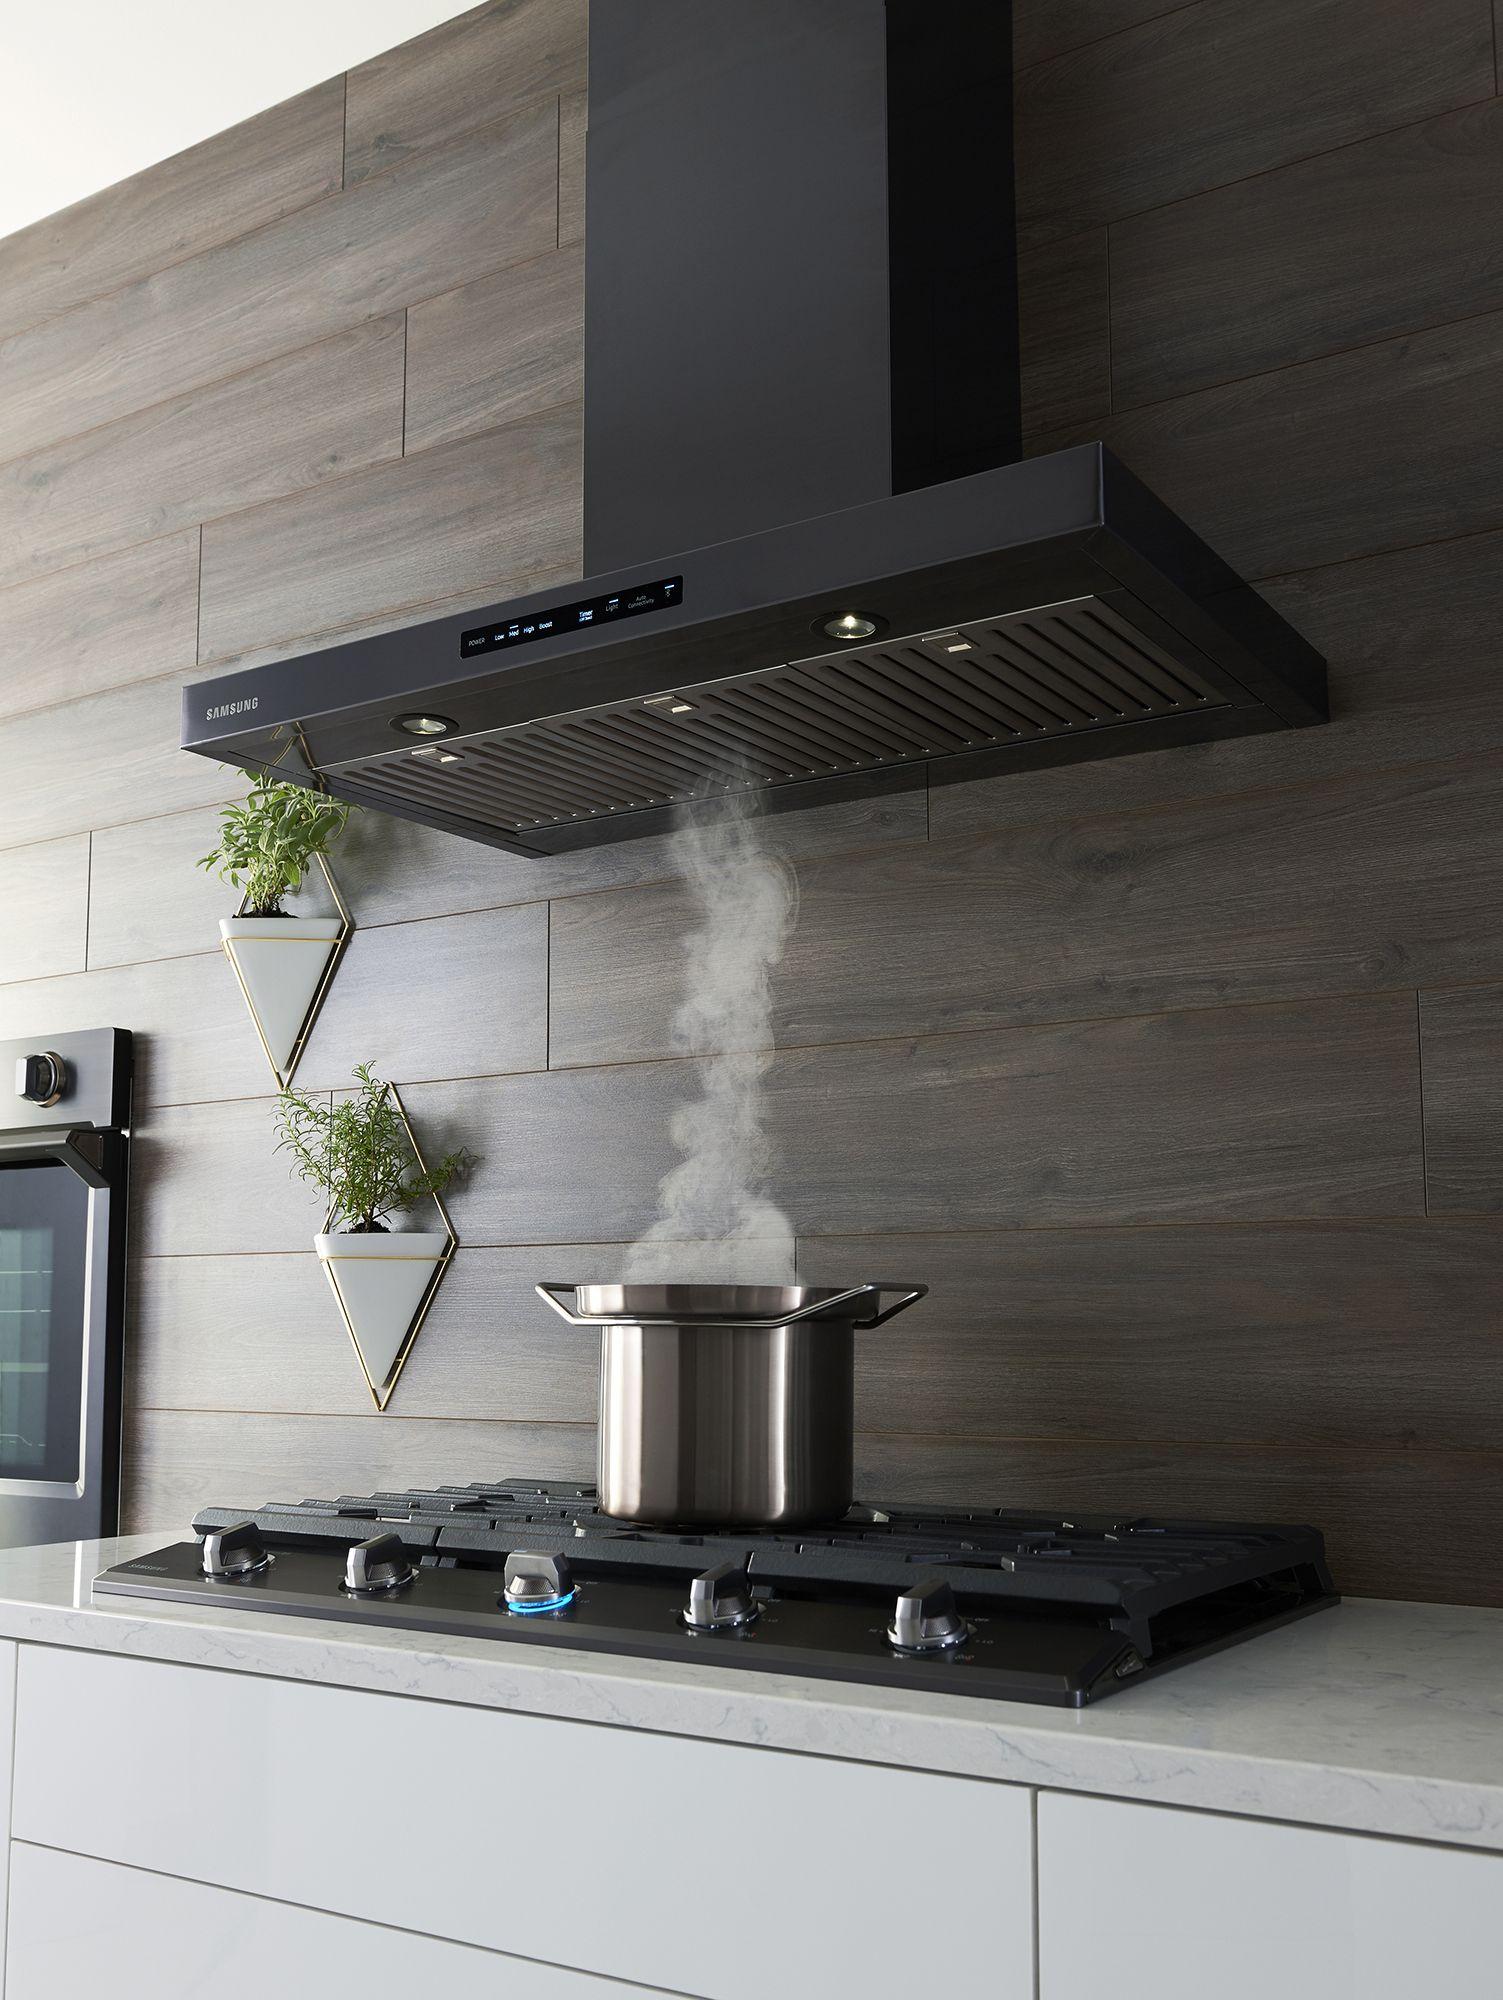 Samsung Cooktops Hoods Use Bluetooth Technology To Work Together For Optimum Performance Modern Kitchen Hood Kitchen Range Hood Black Stainless Steel Kitchen